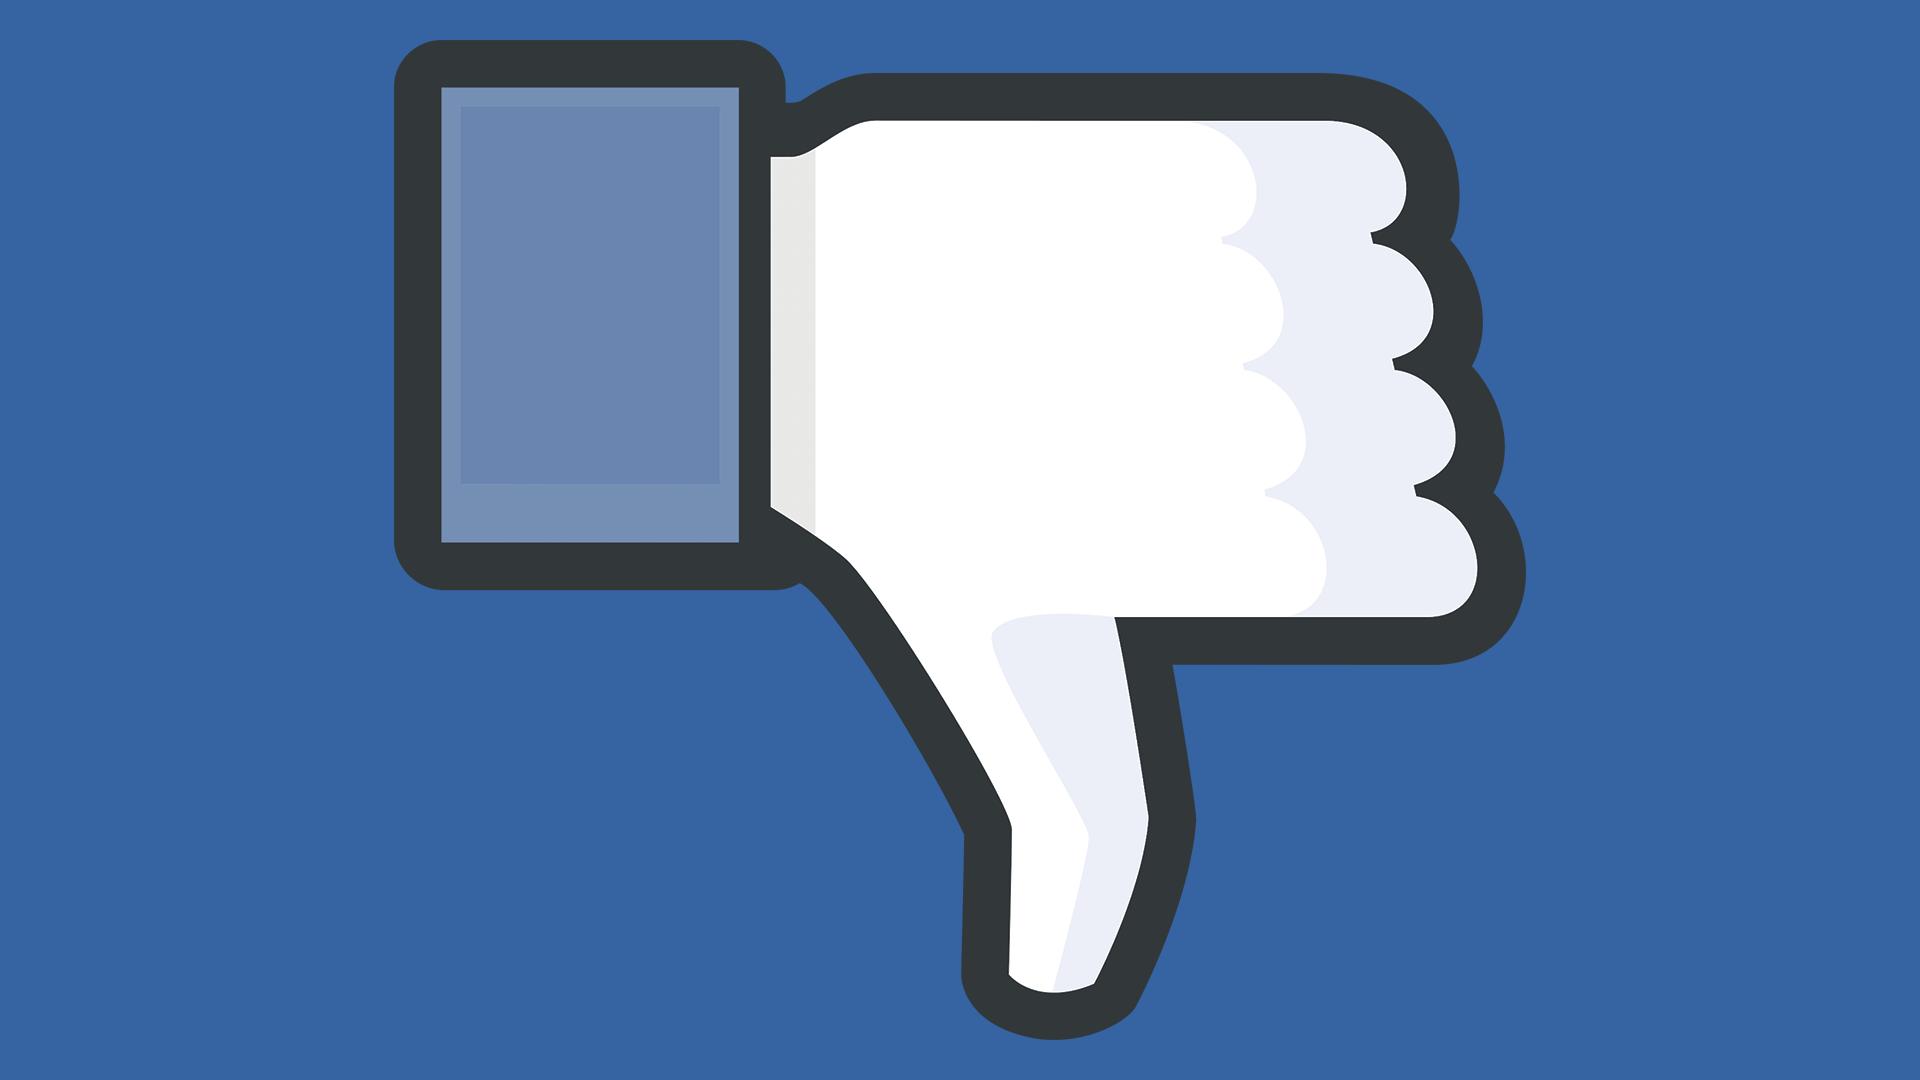 facebook-thumbdown2-1920